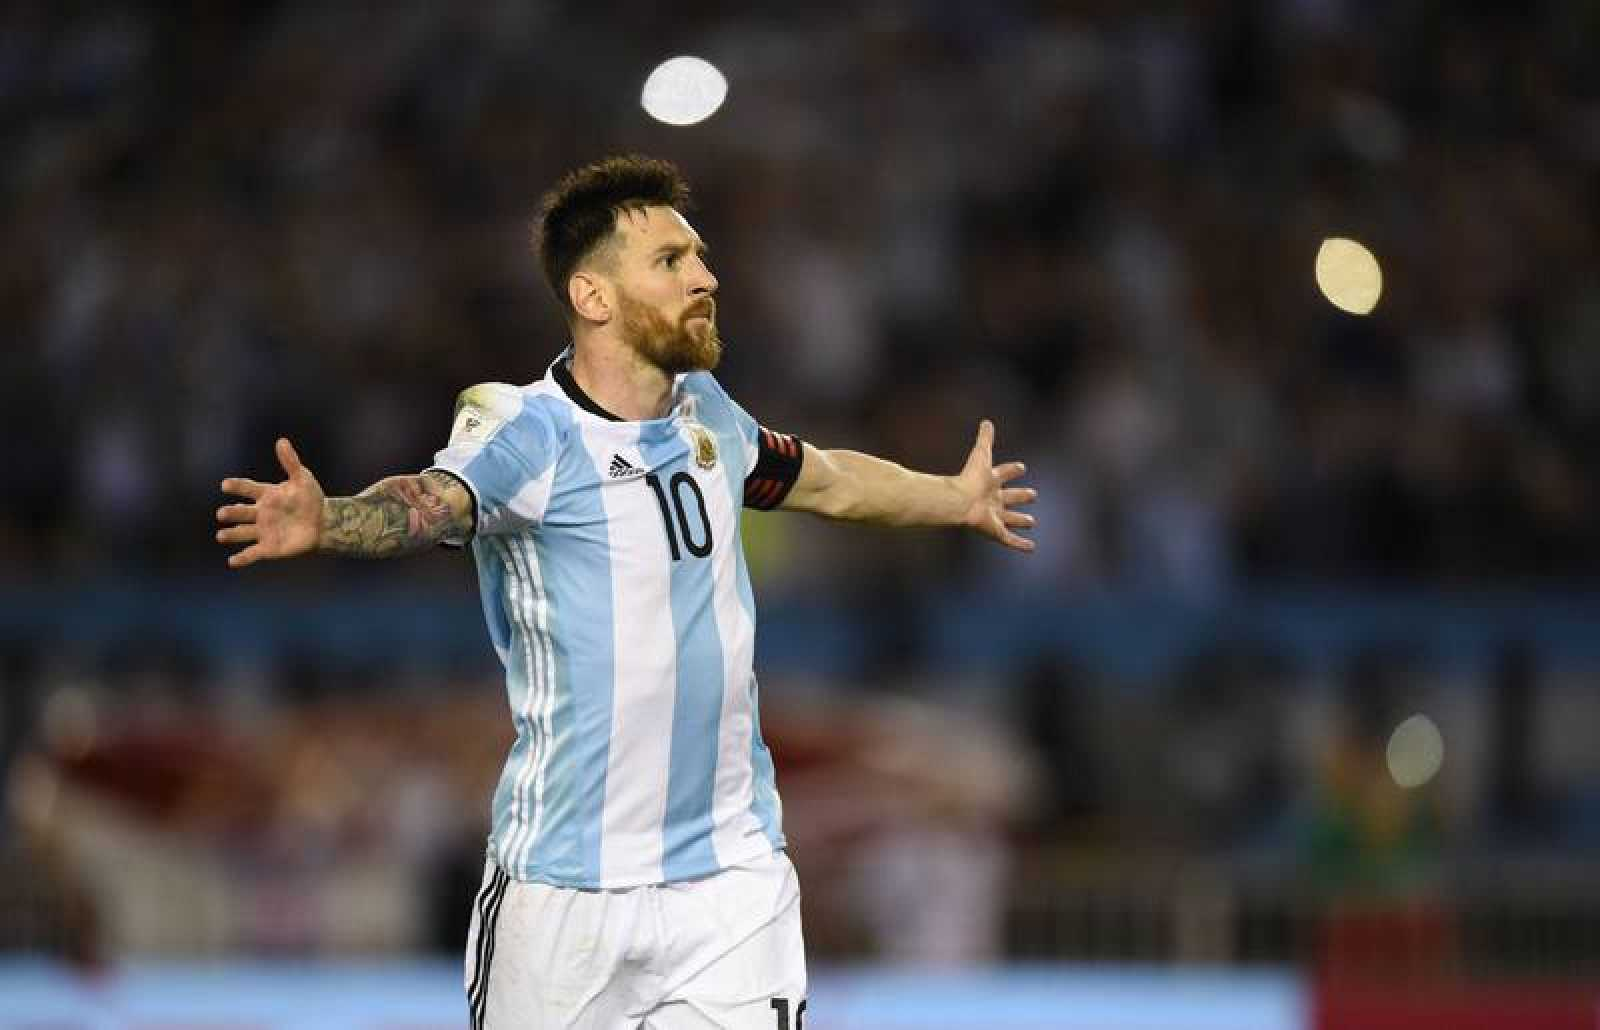 El argentino Leo Messi espera llevarse el Mundial de Rusia.